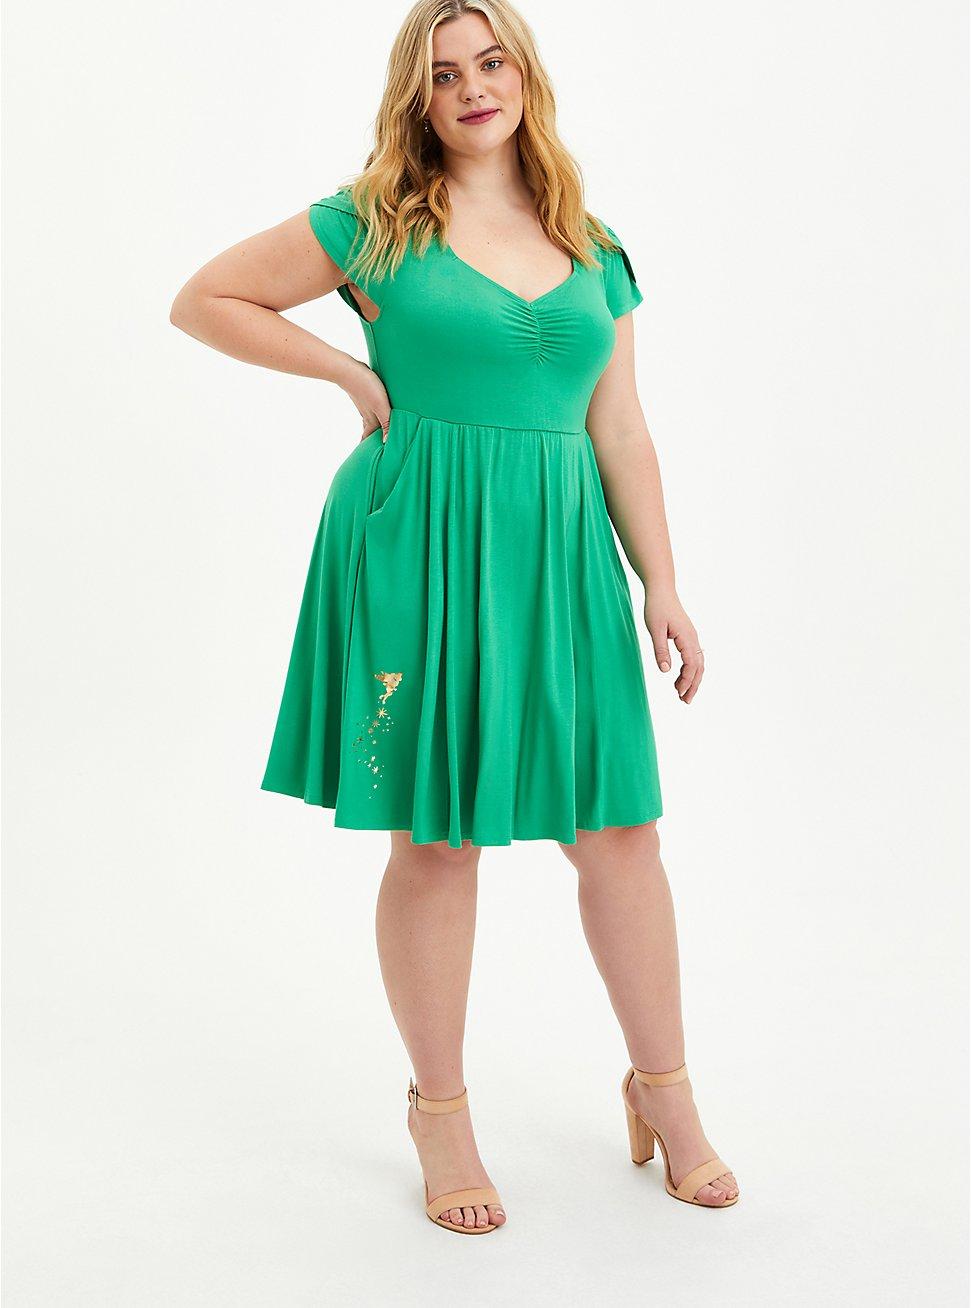 Disney Tinkerbell Shirred Skater Dress, GREEN, hi-res